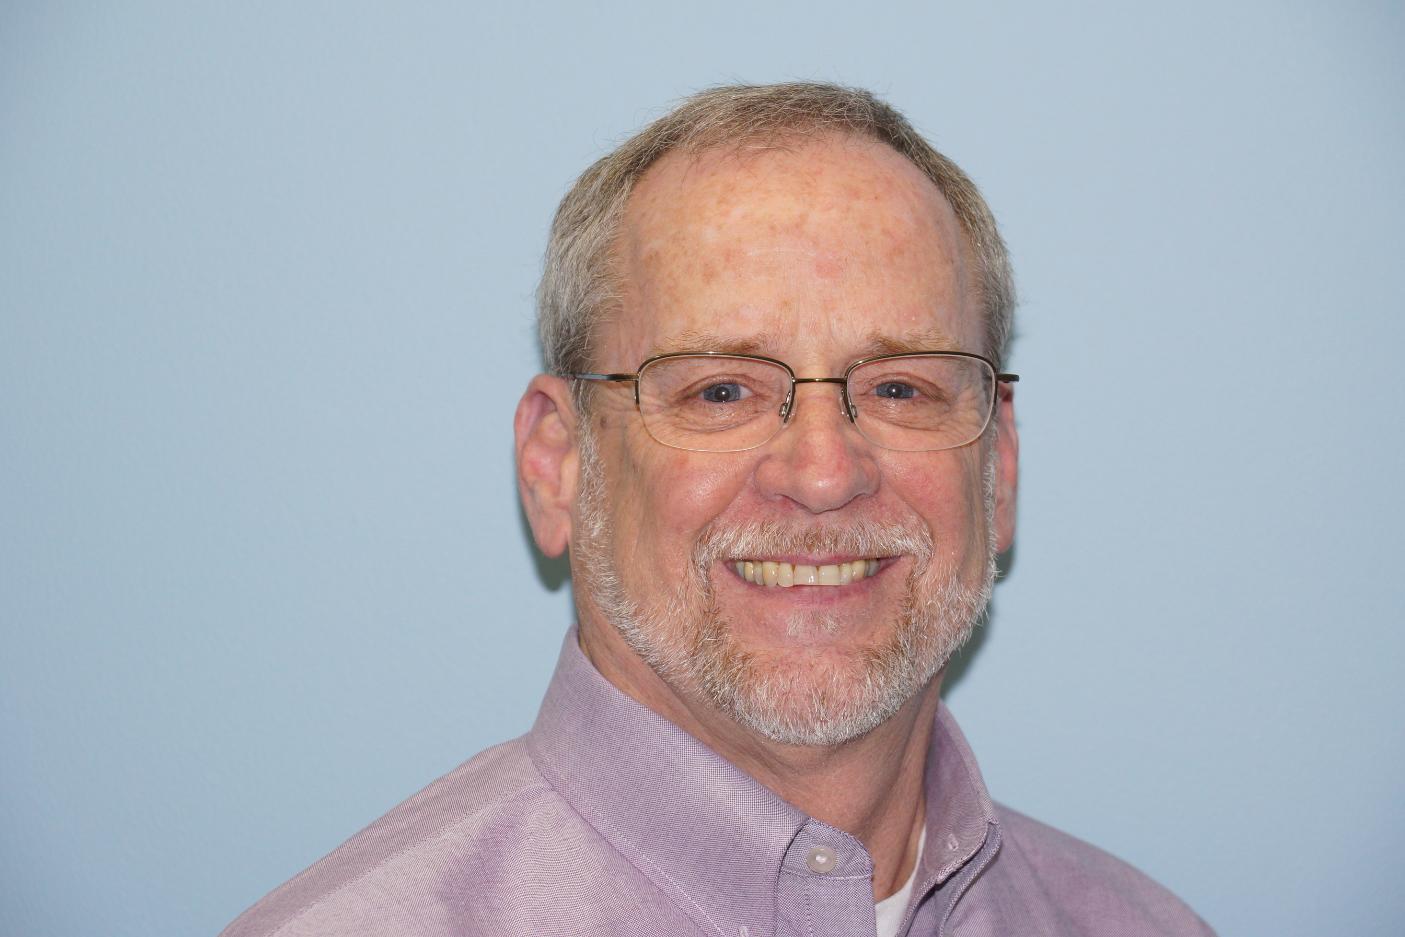 Mark J. Tompkins, CET   About the Author